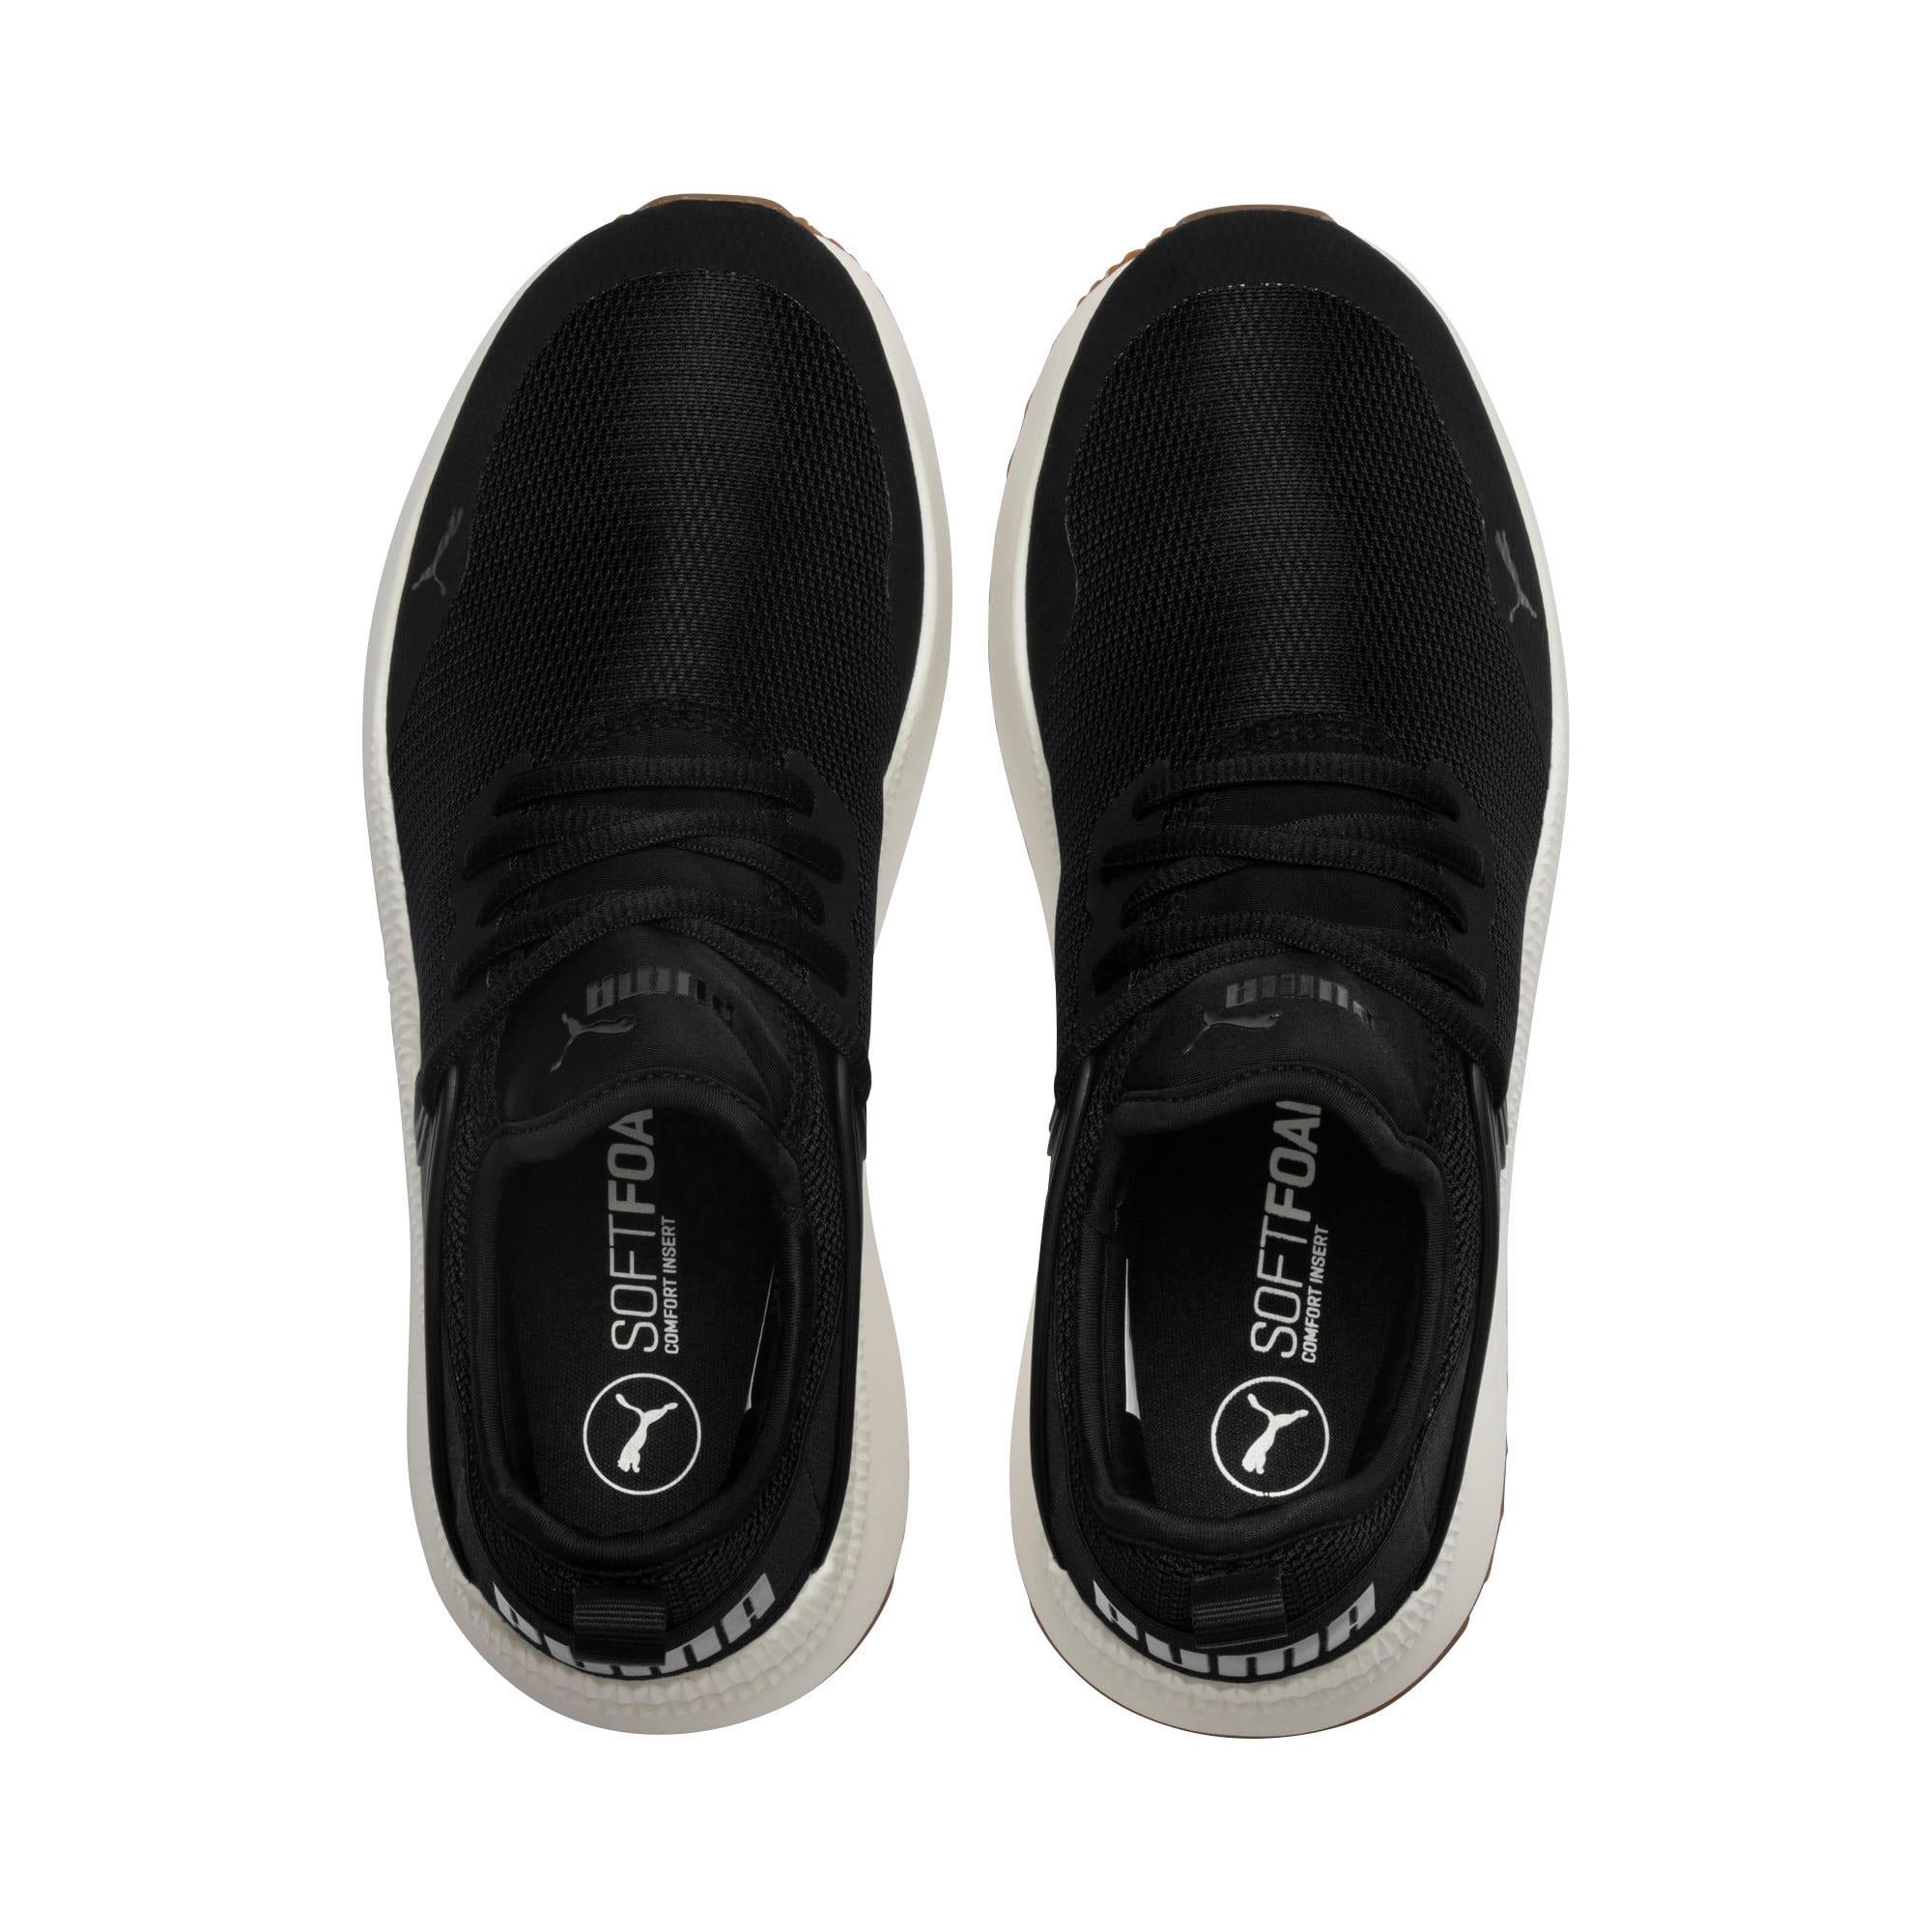 Thumbnail 6 of Pacer Next Cage Sneakers, P. Black-P. Black-Whis.White, medium